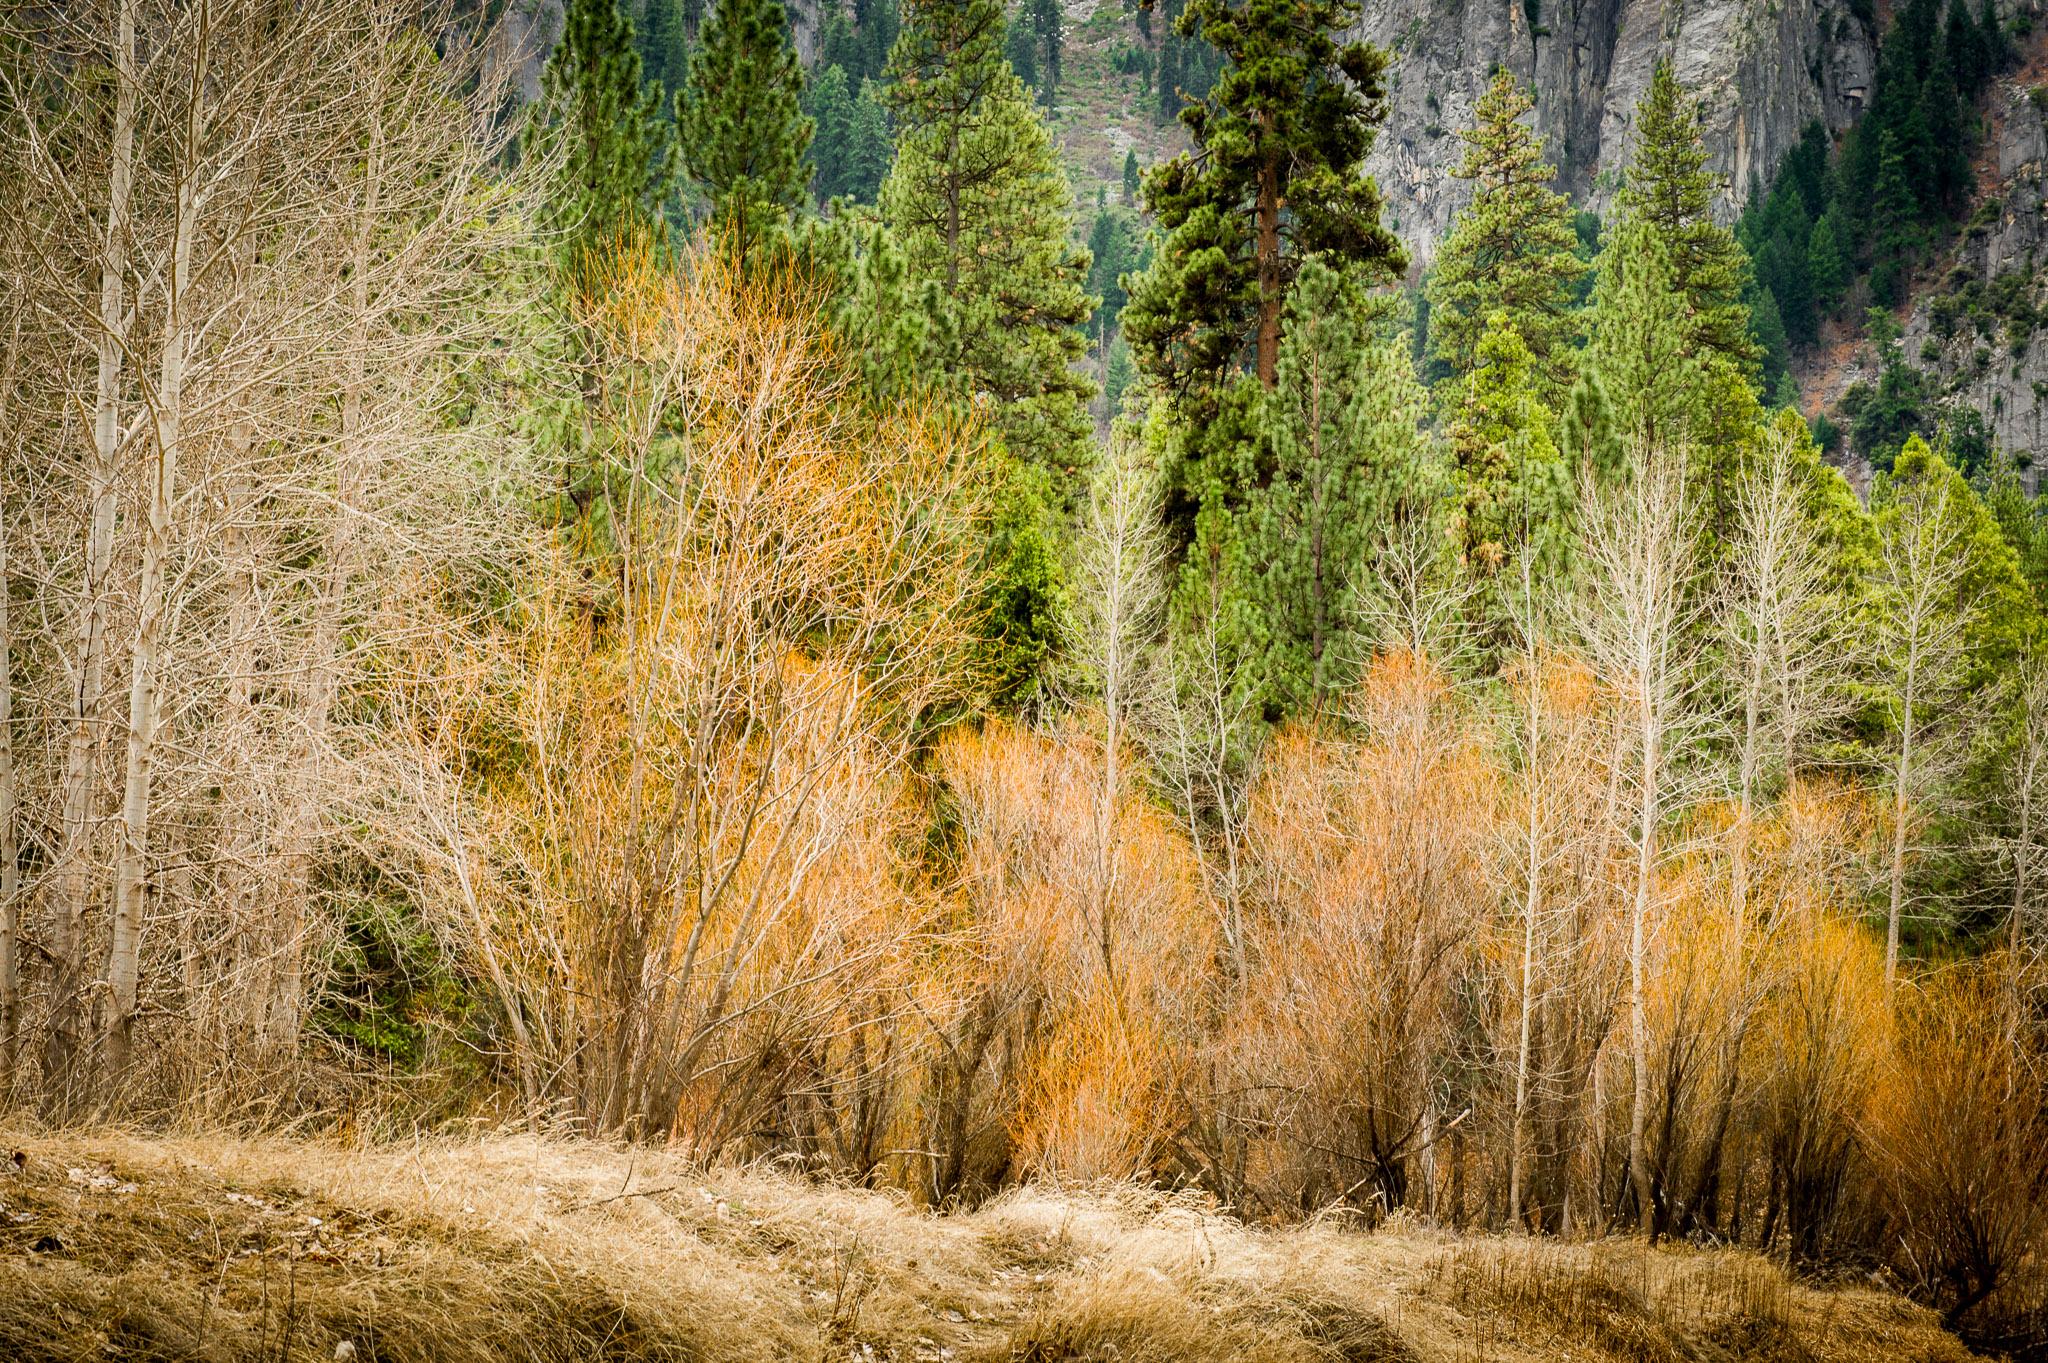 Jason-Davis-Images-Yosemite-0028.jpg